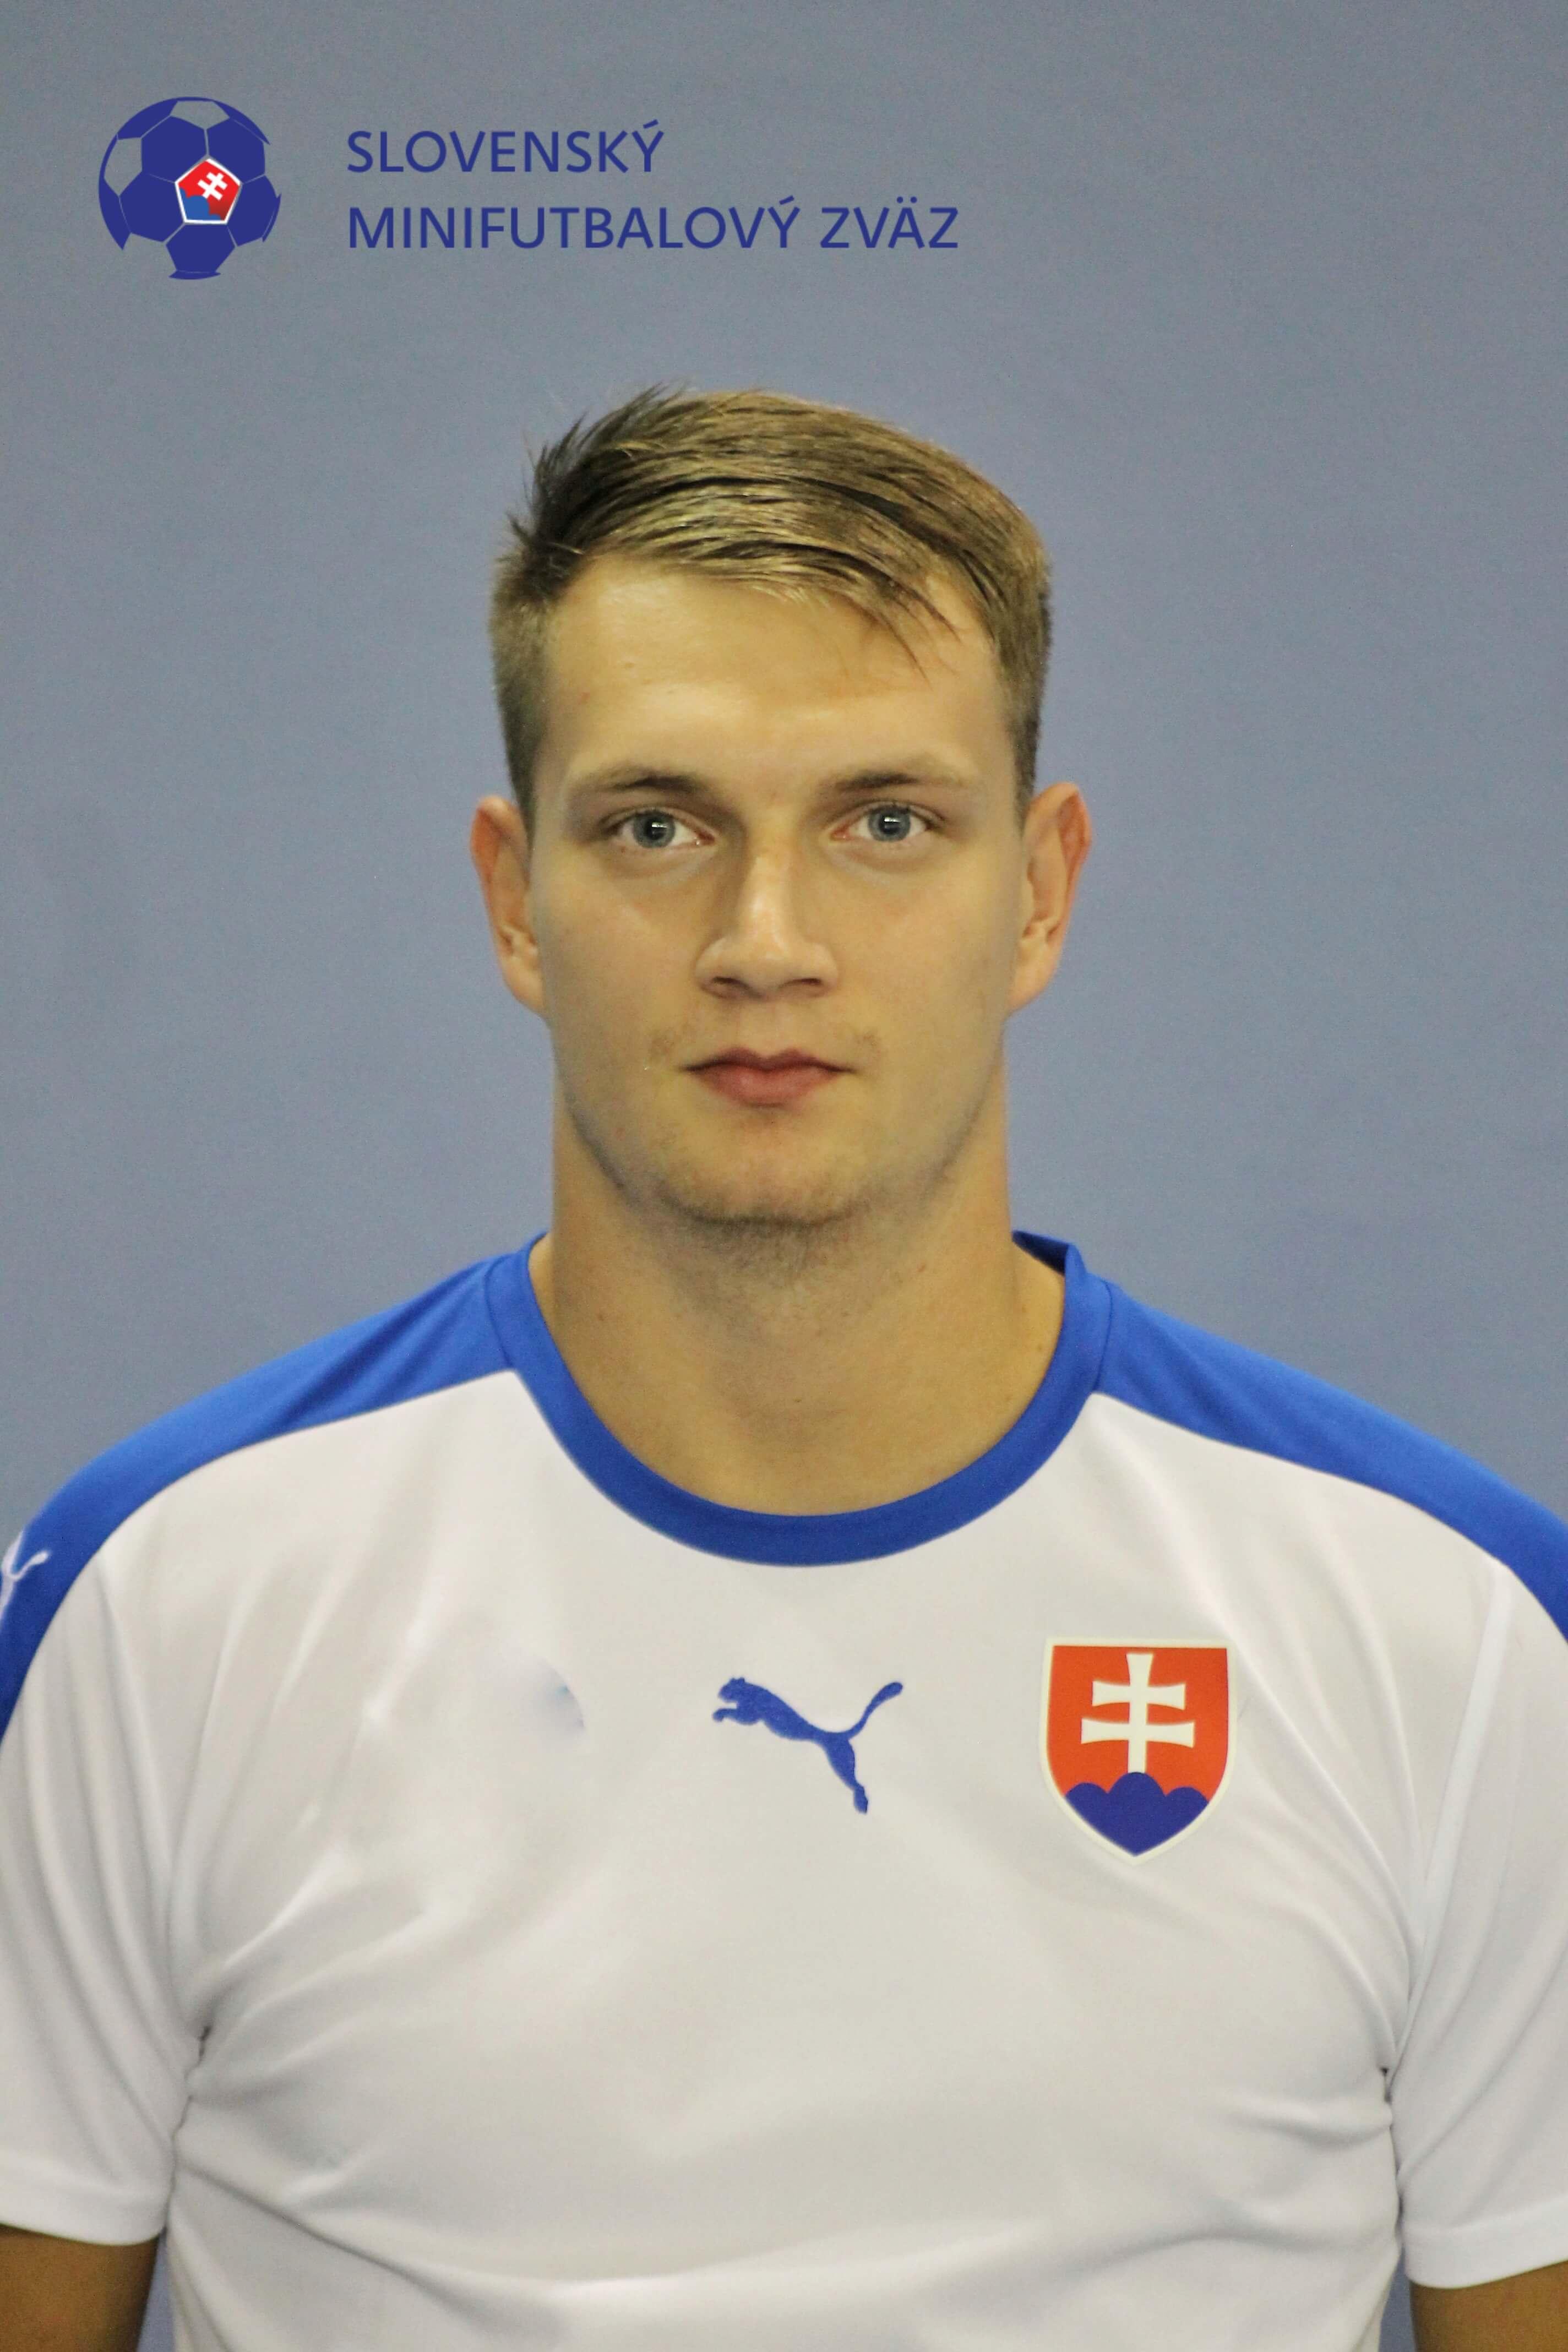 Michal Uhliarik